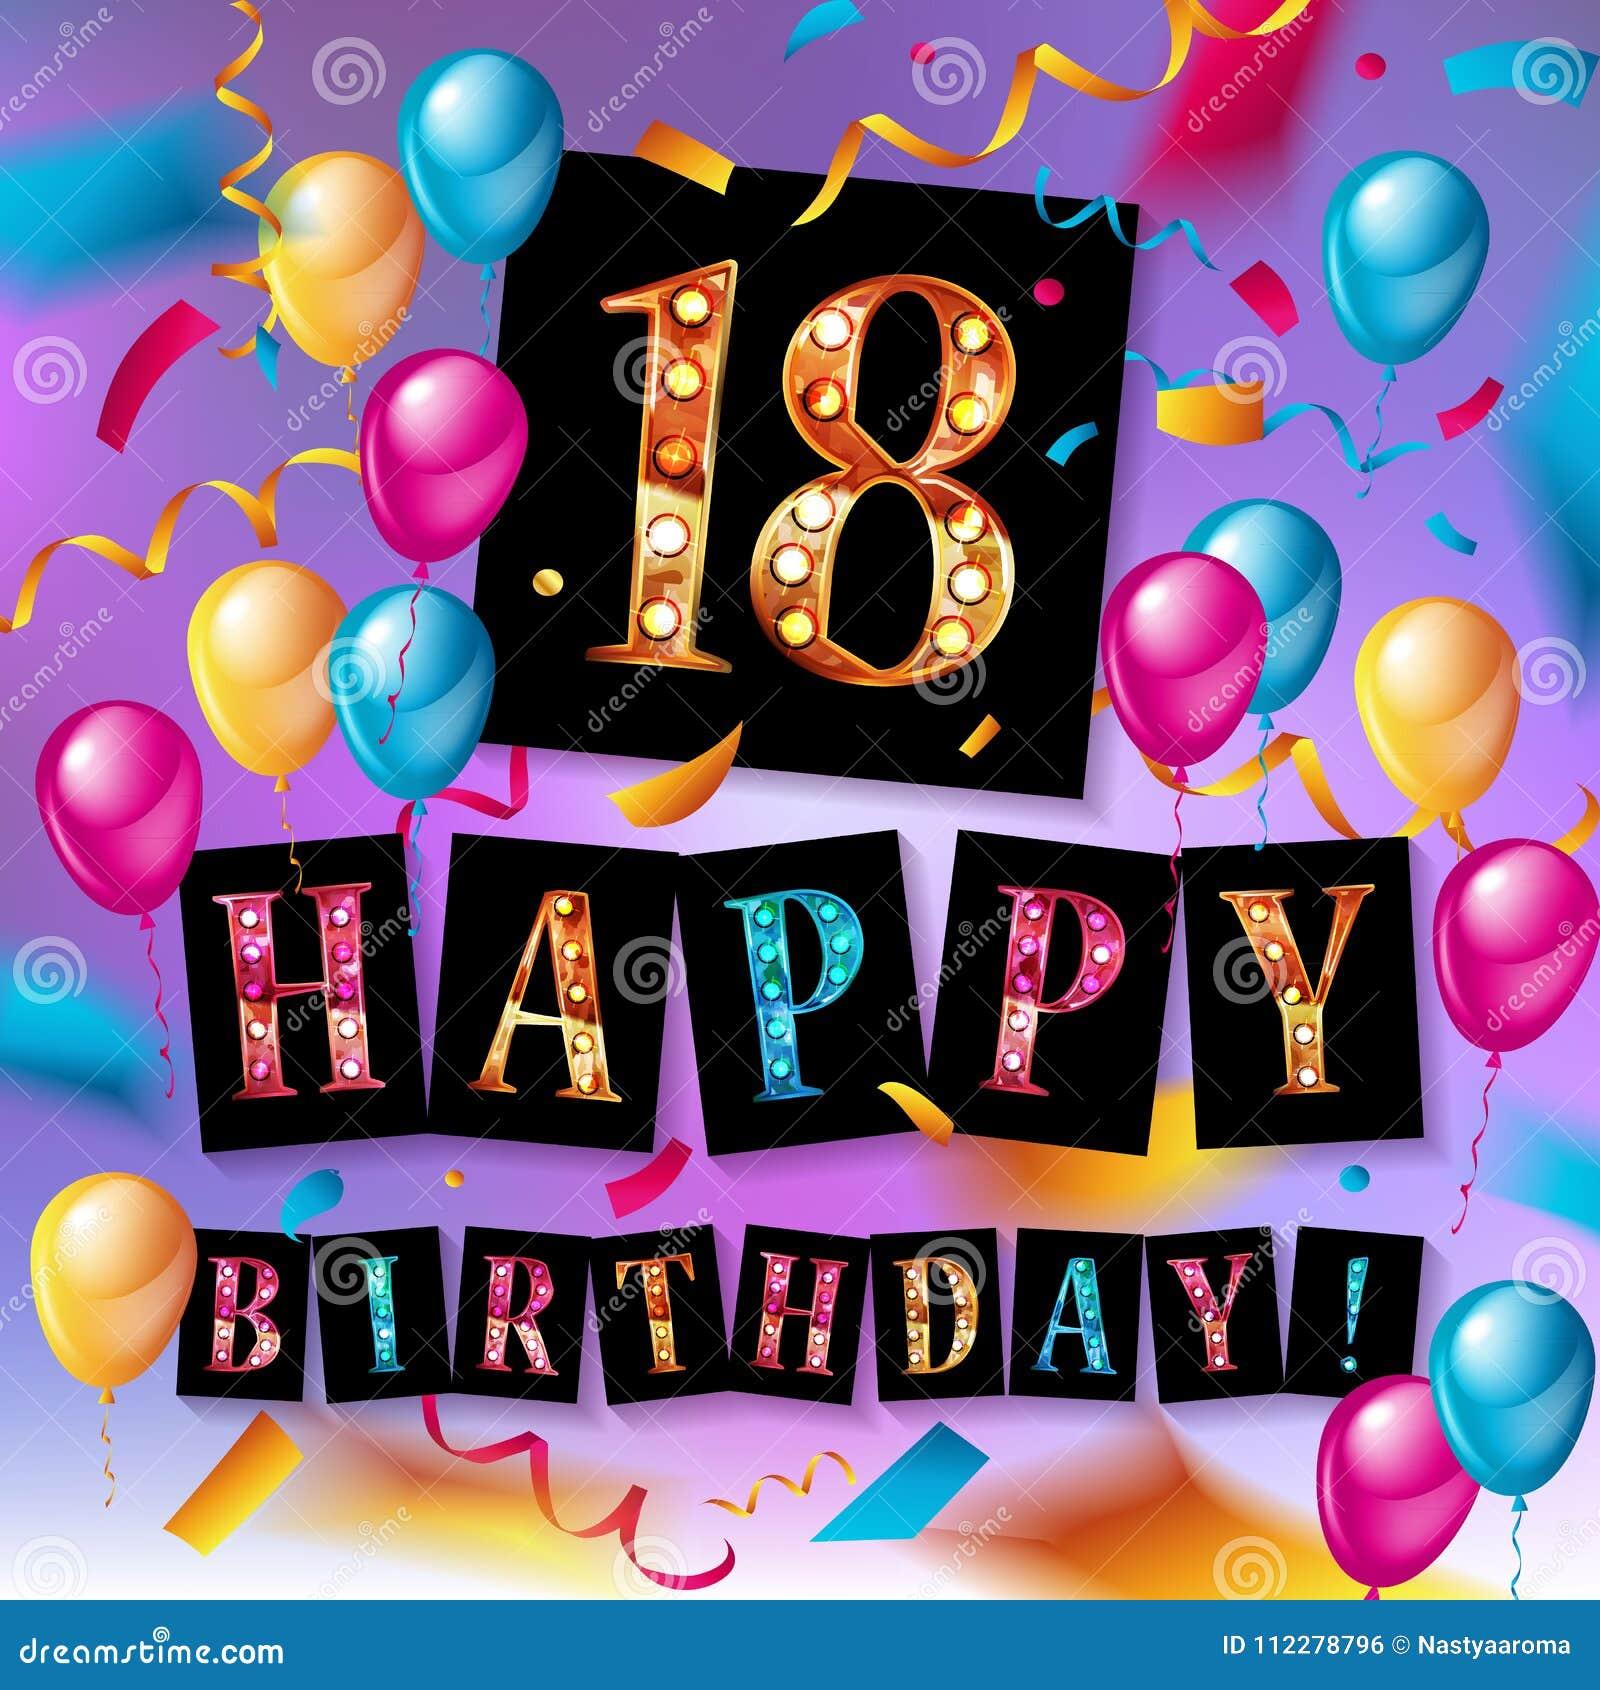 verjaardag 18 jaar Gelukkige Verjaardag 18 Jaar Verjaardags Stock Illustratie  verjaardag 18 jaar